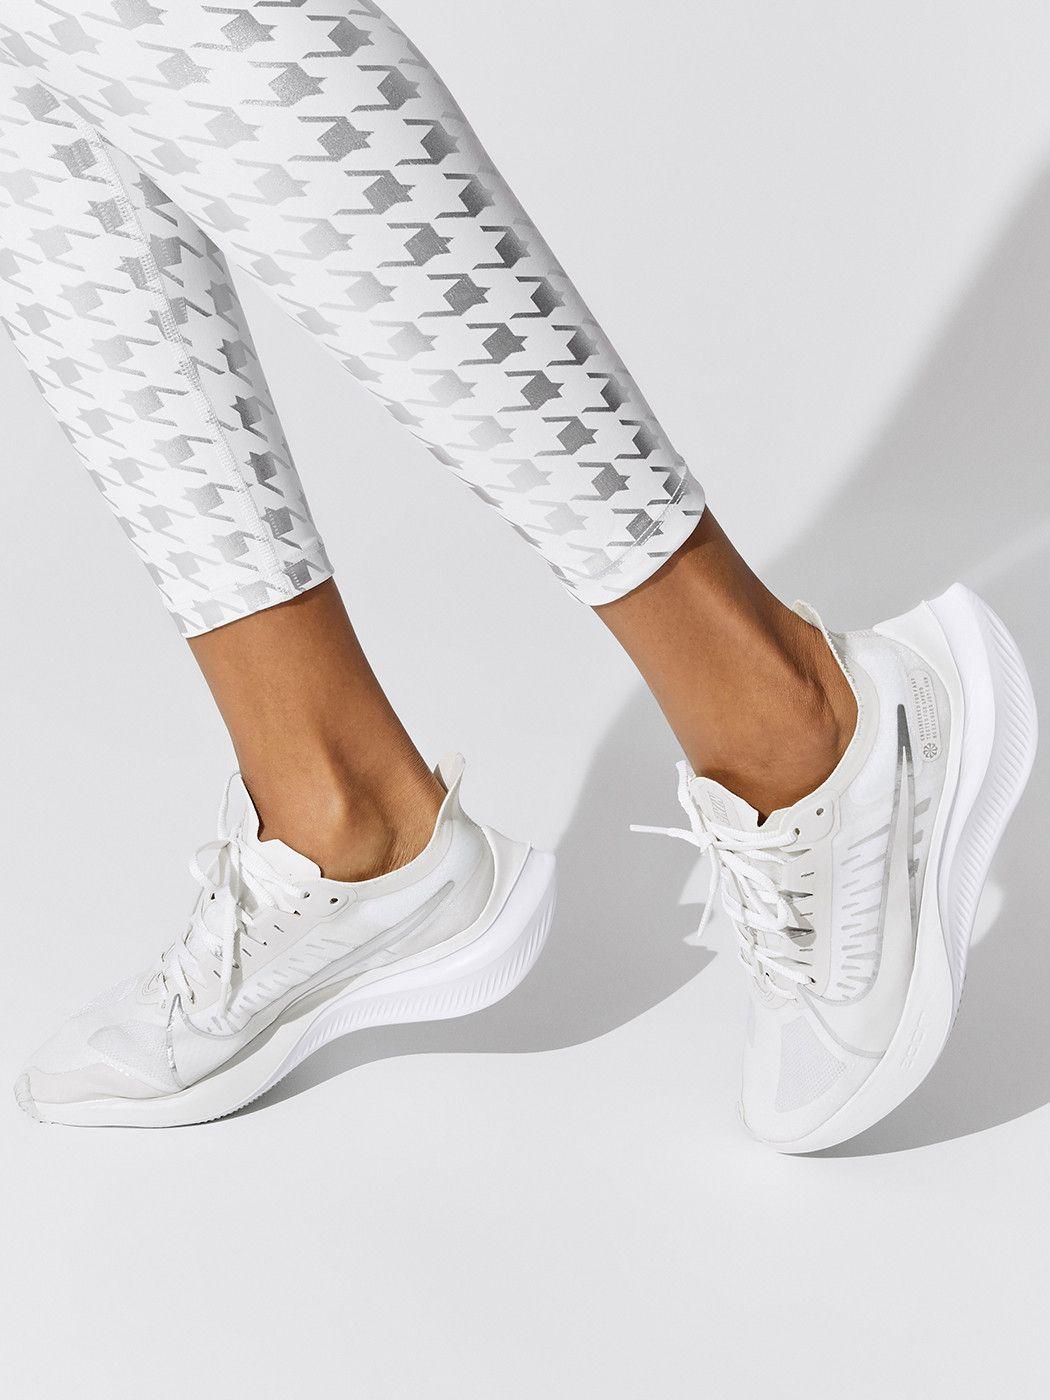 Nike Zoom Gravity | Nike zoom, Nike